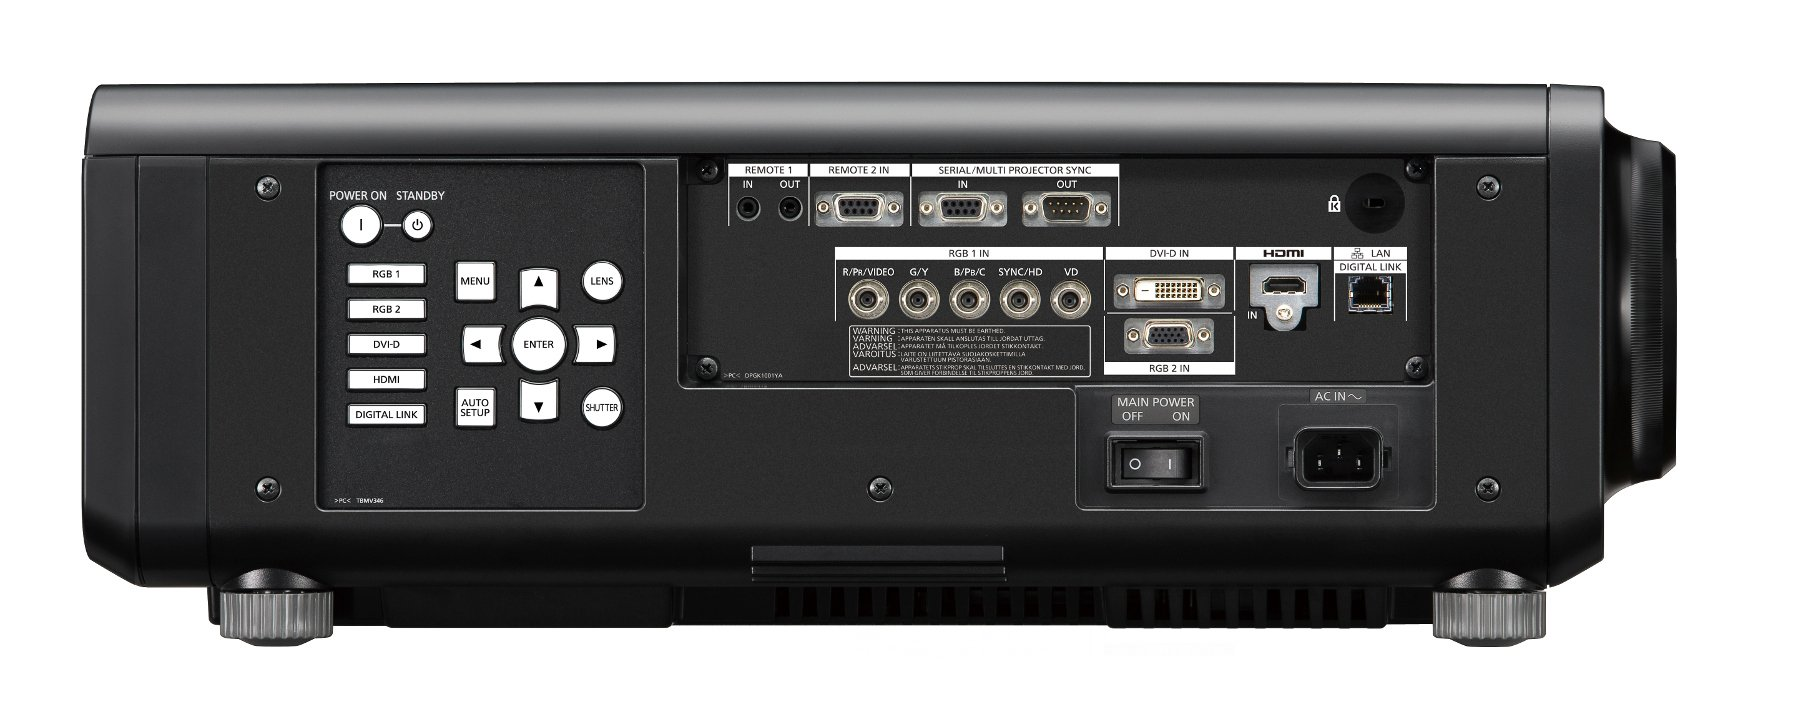 10,000 Lumens WXGA DLP Laser Projector Body Only in Black